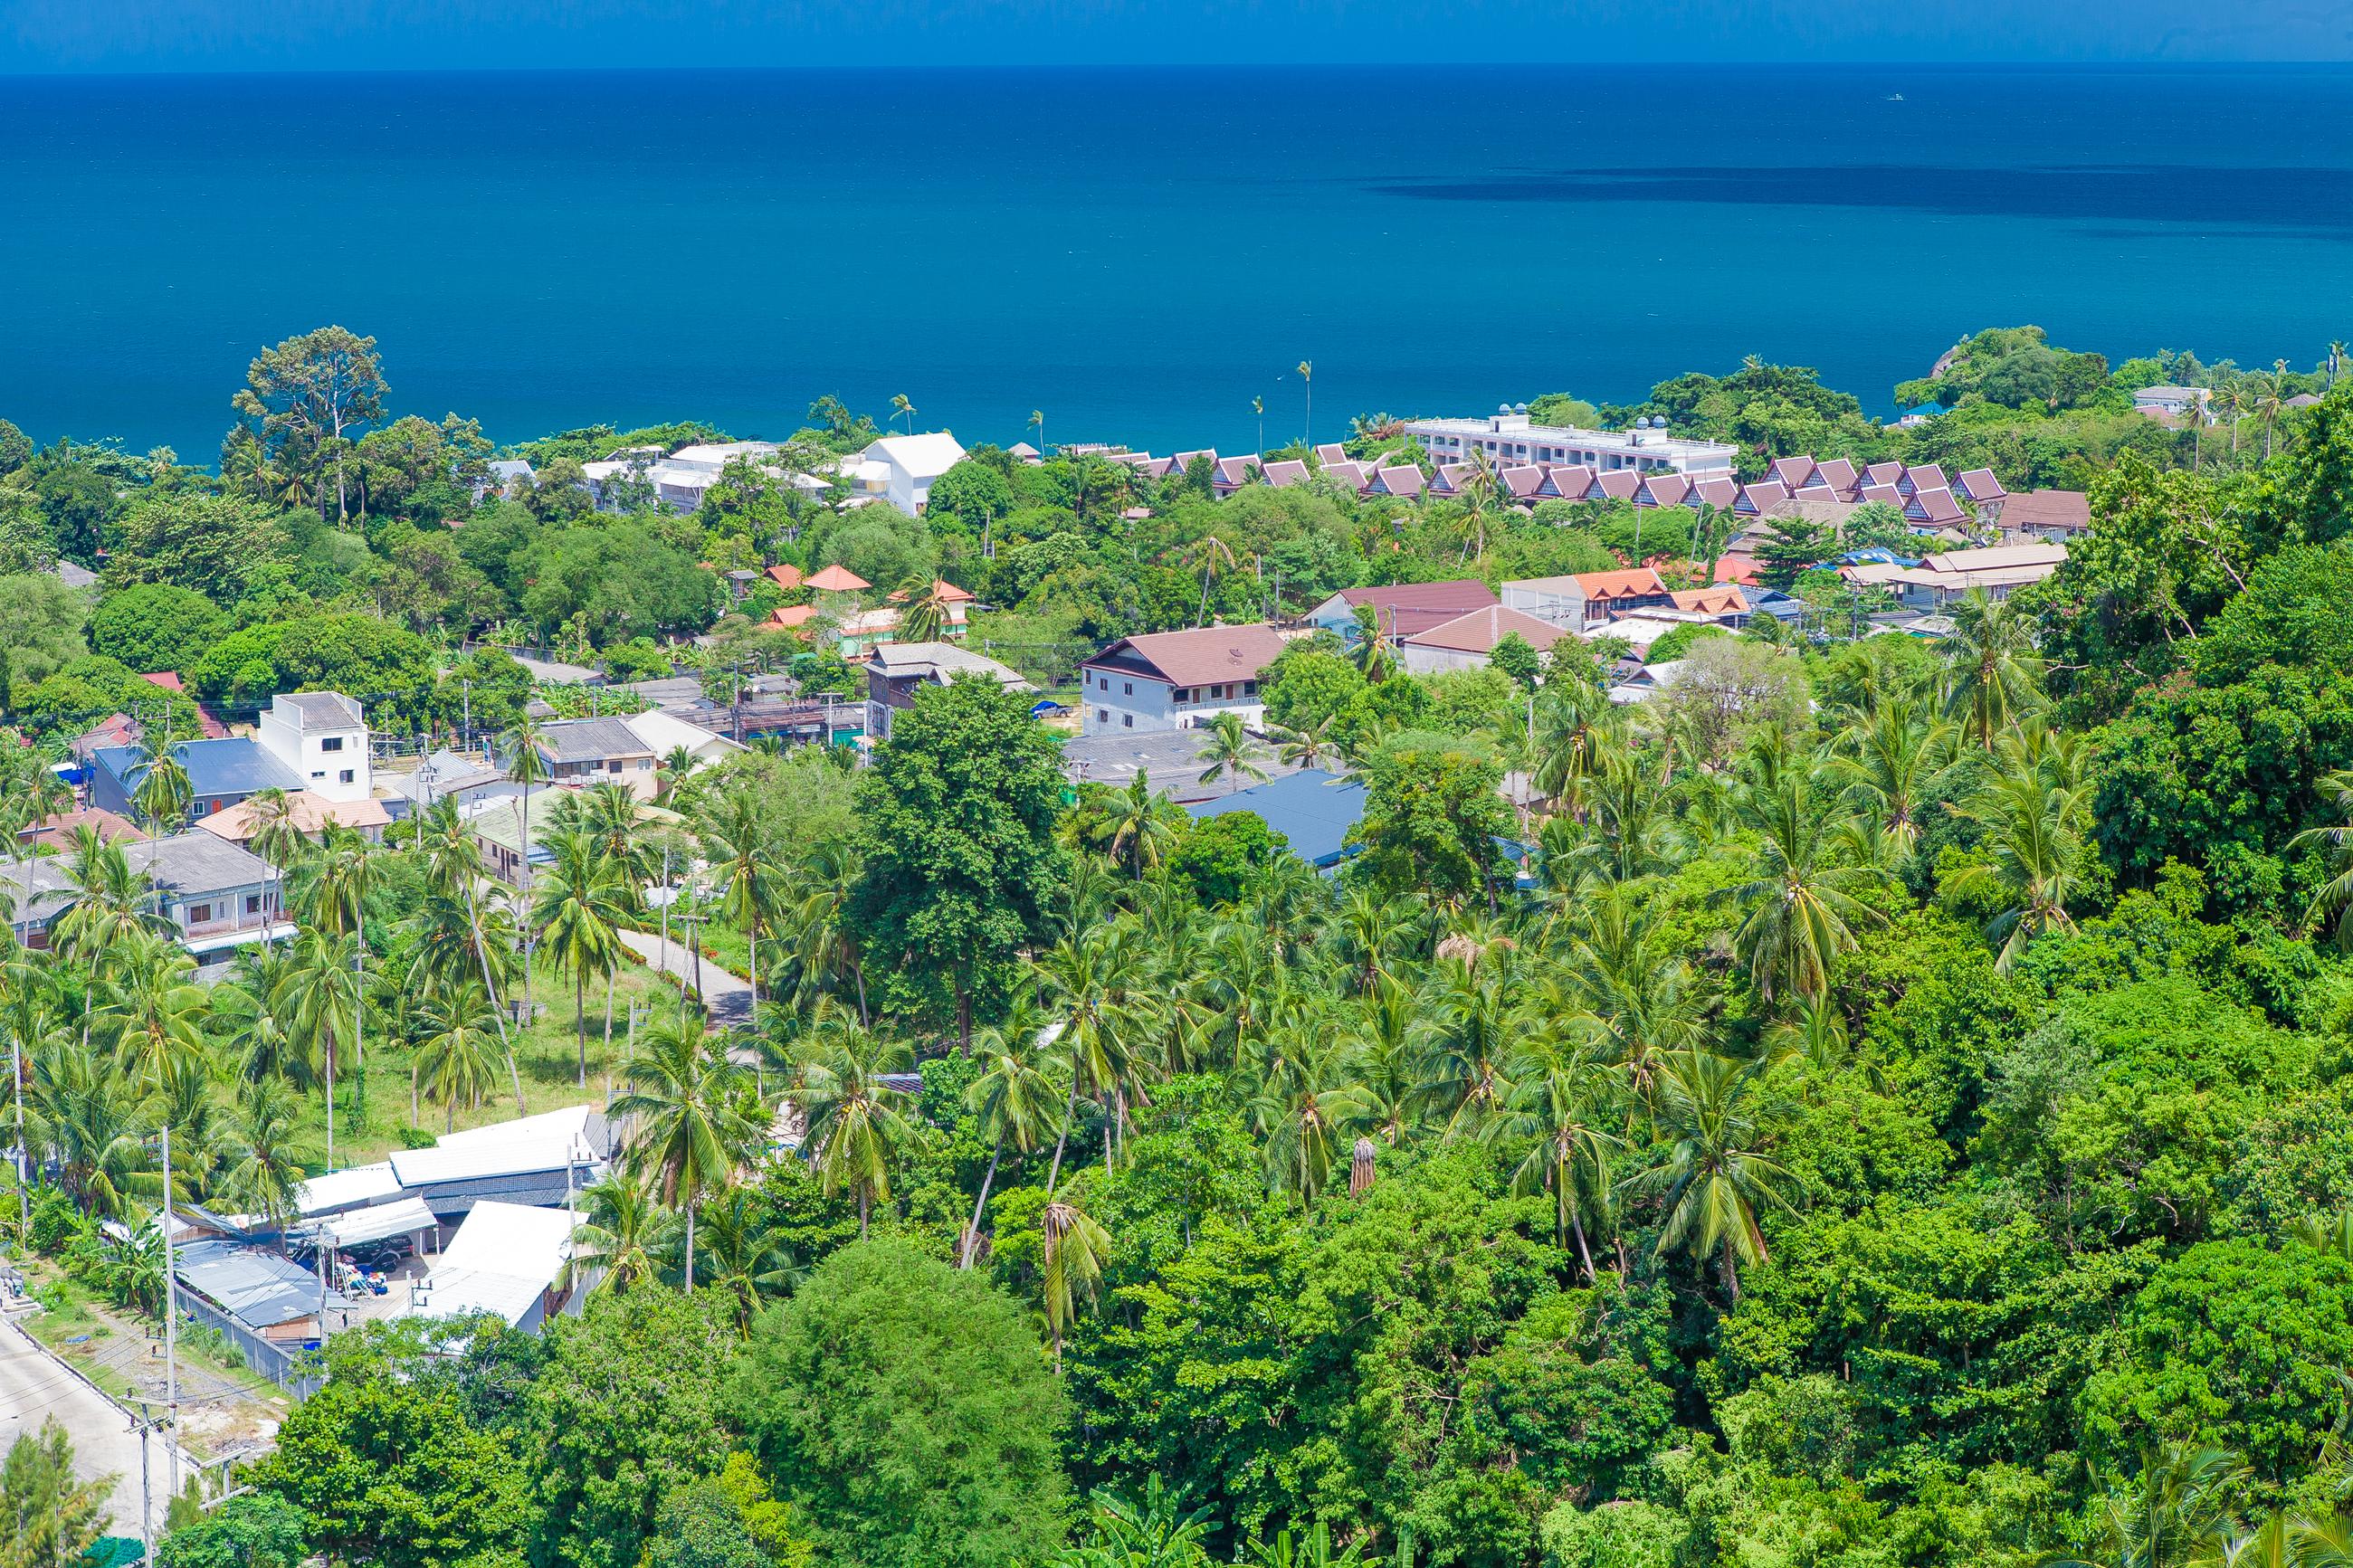 Lamai view point - Yachts & Tours on Koh Samui